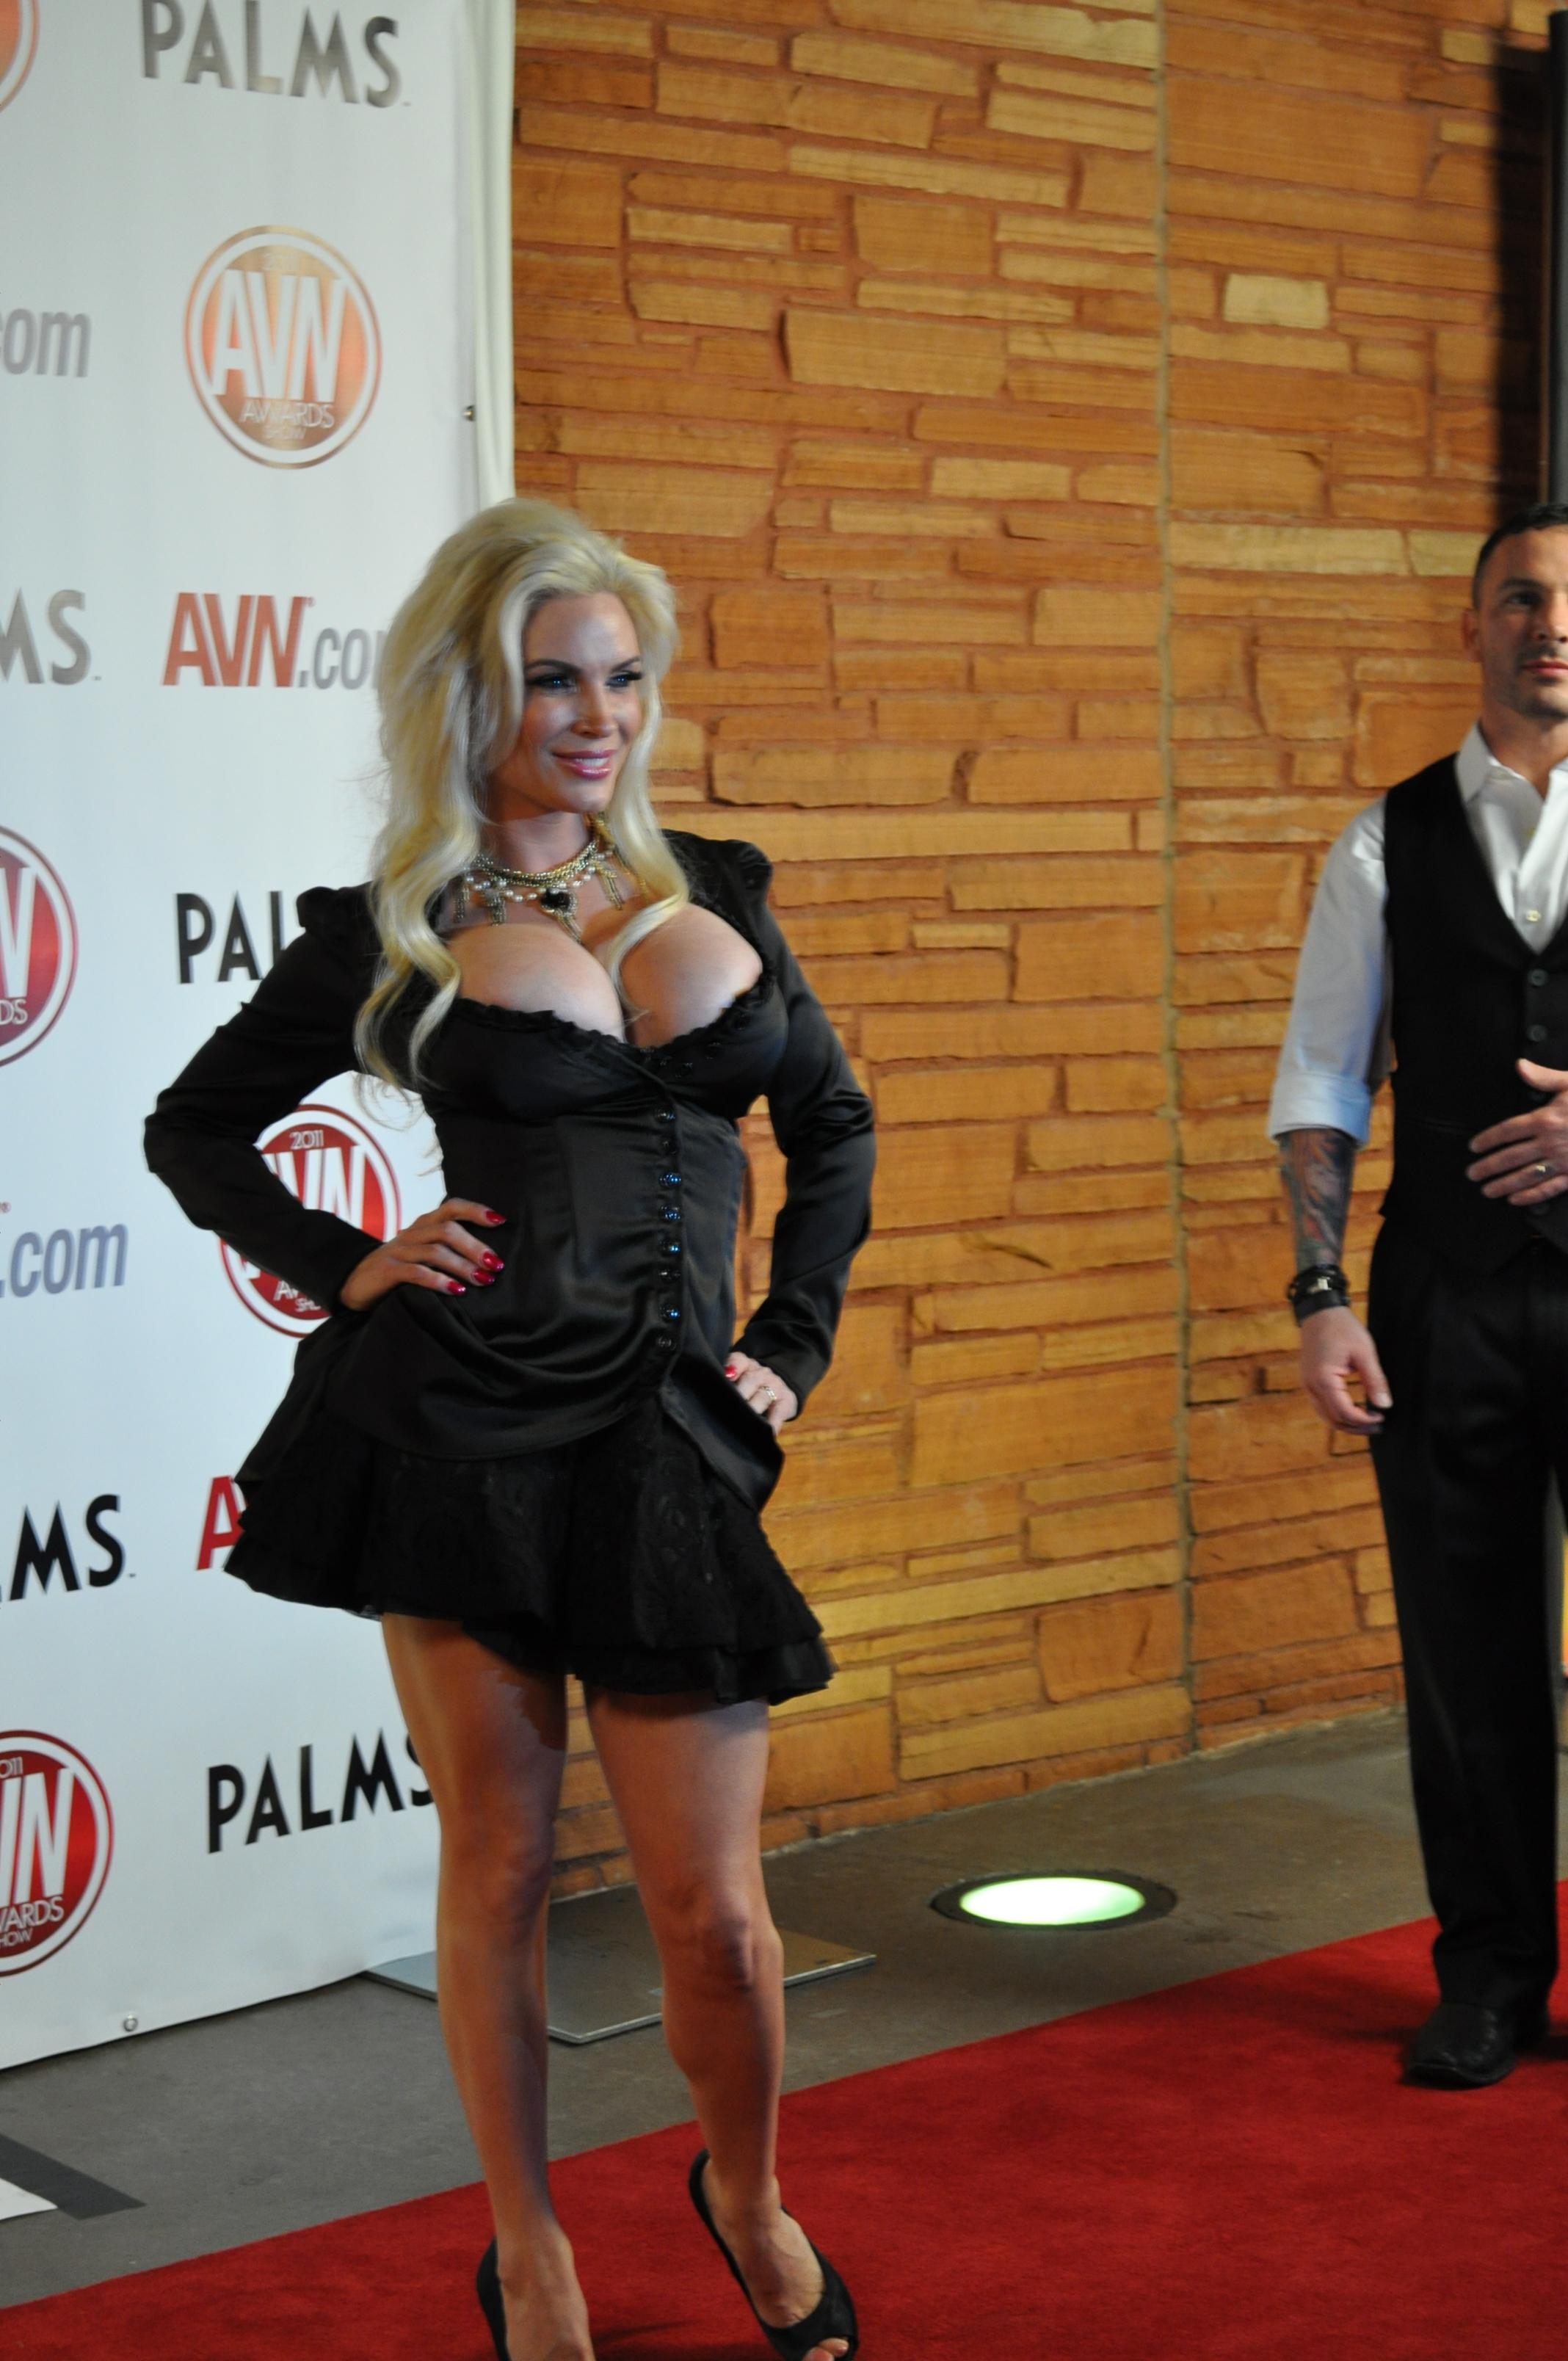 Filediamond Foxxx At Avn Awards 2011 1 Jpg